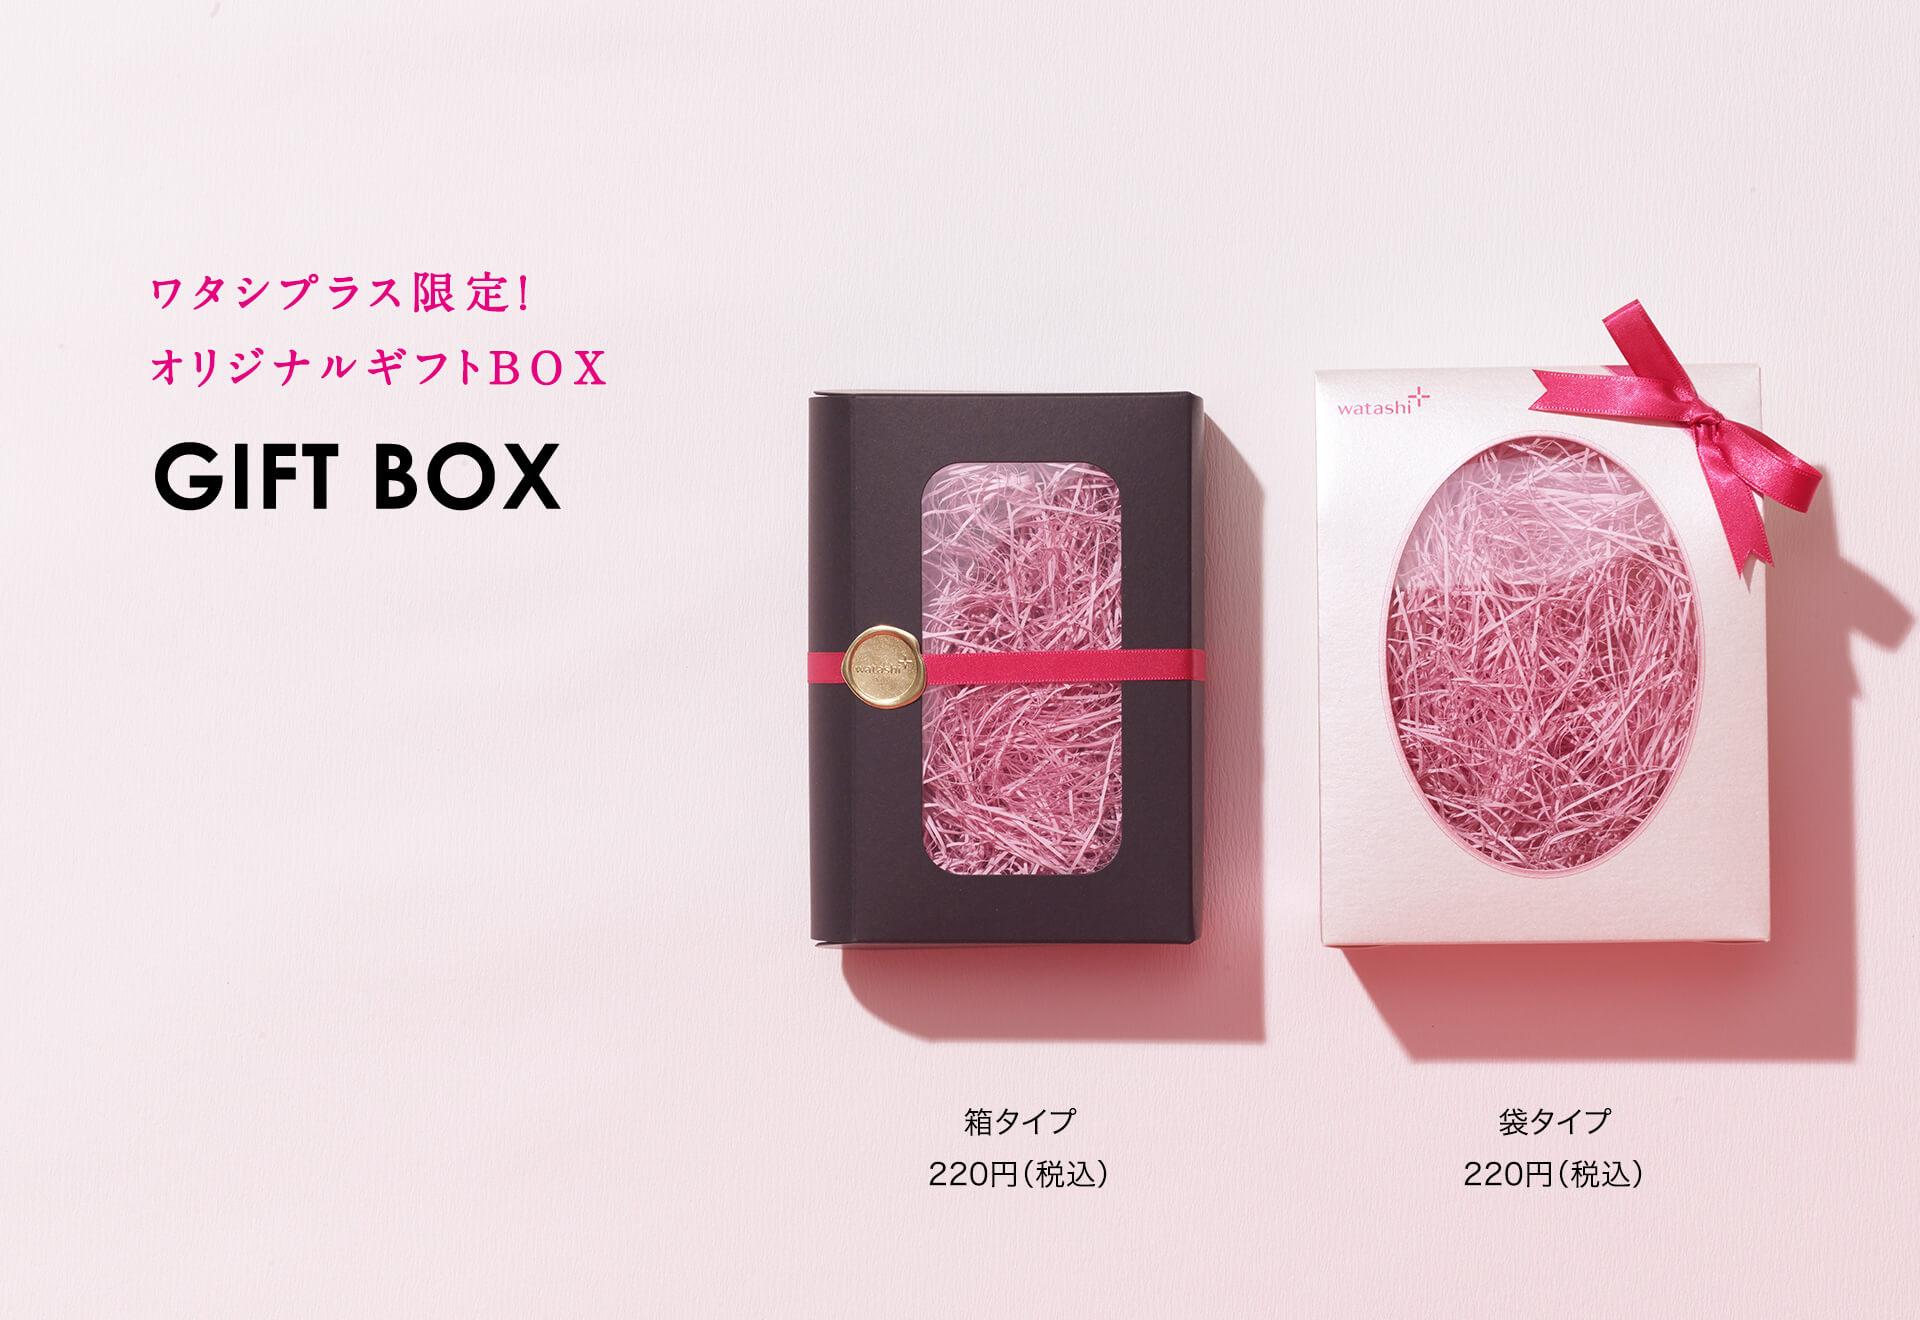 boxgift box negle Image collections